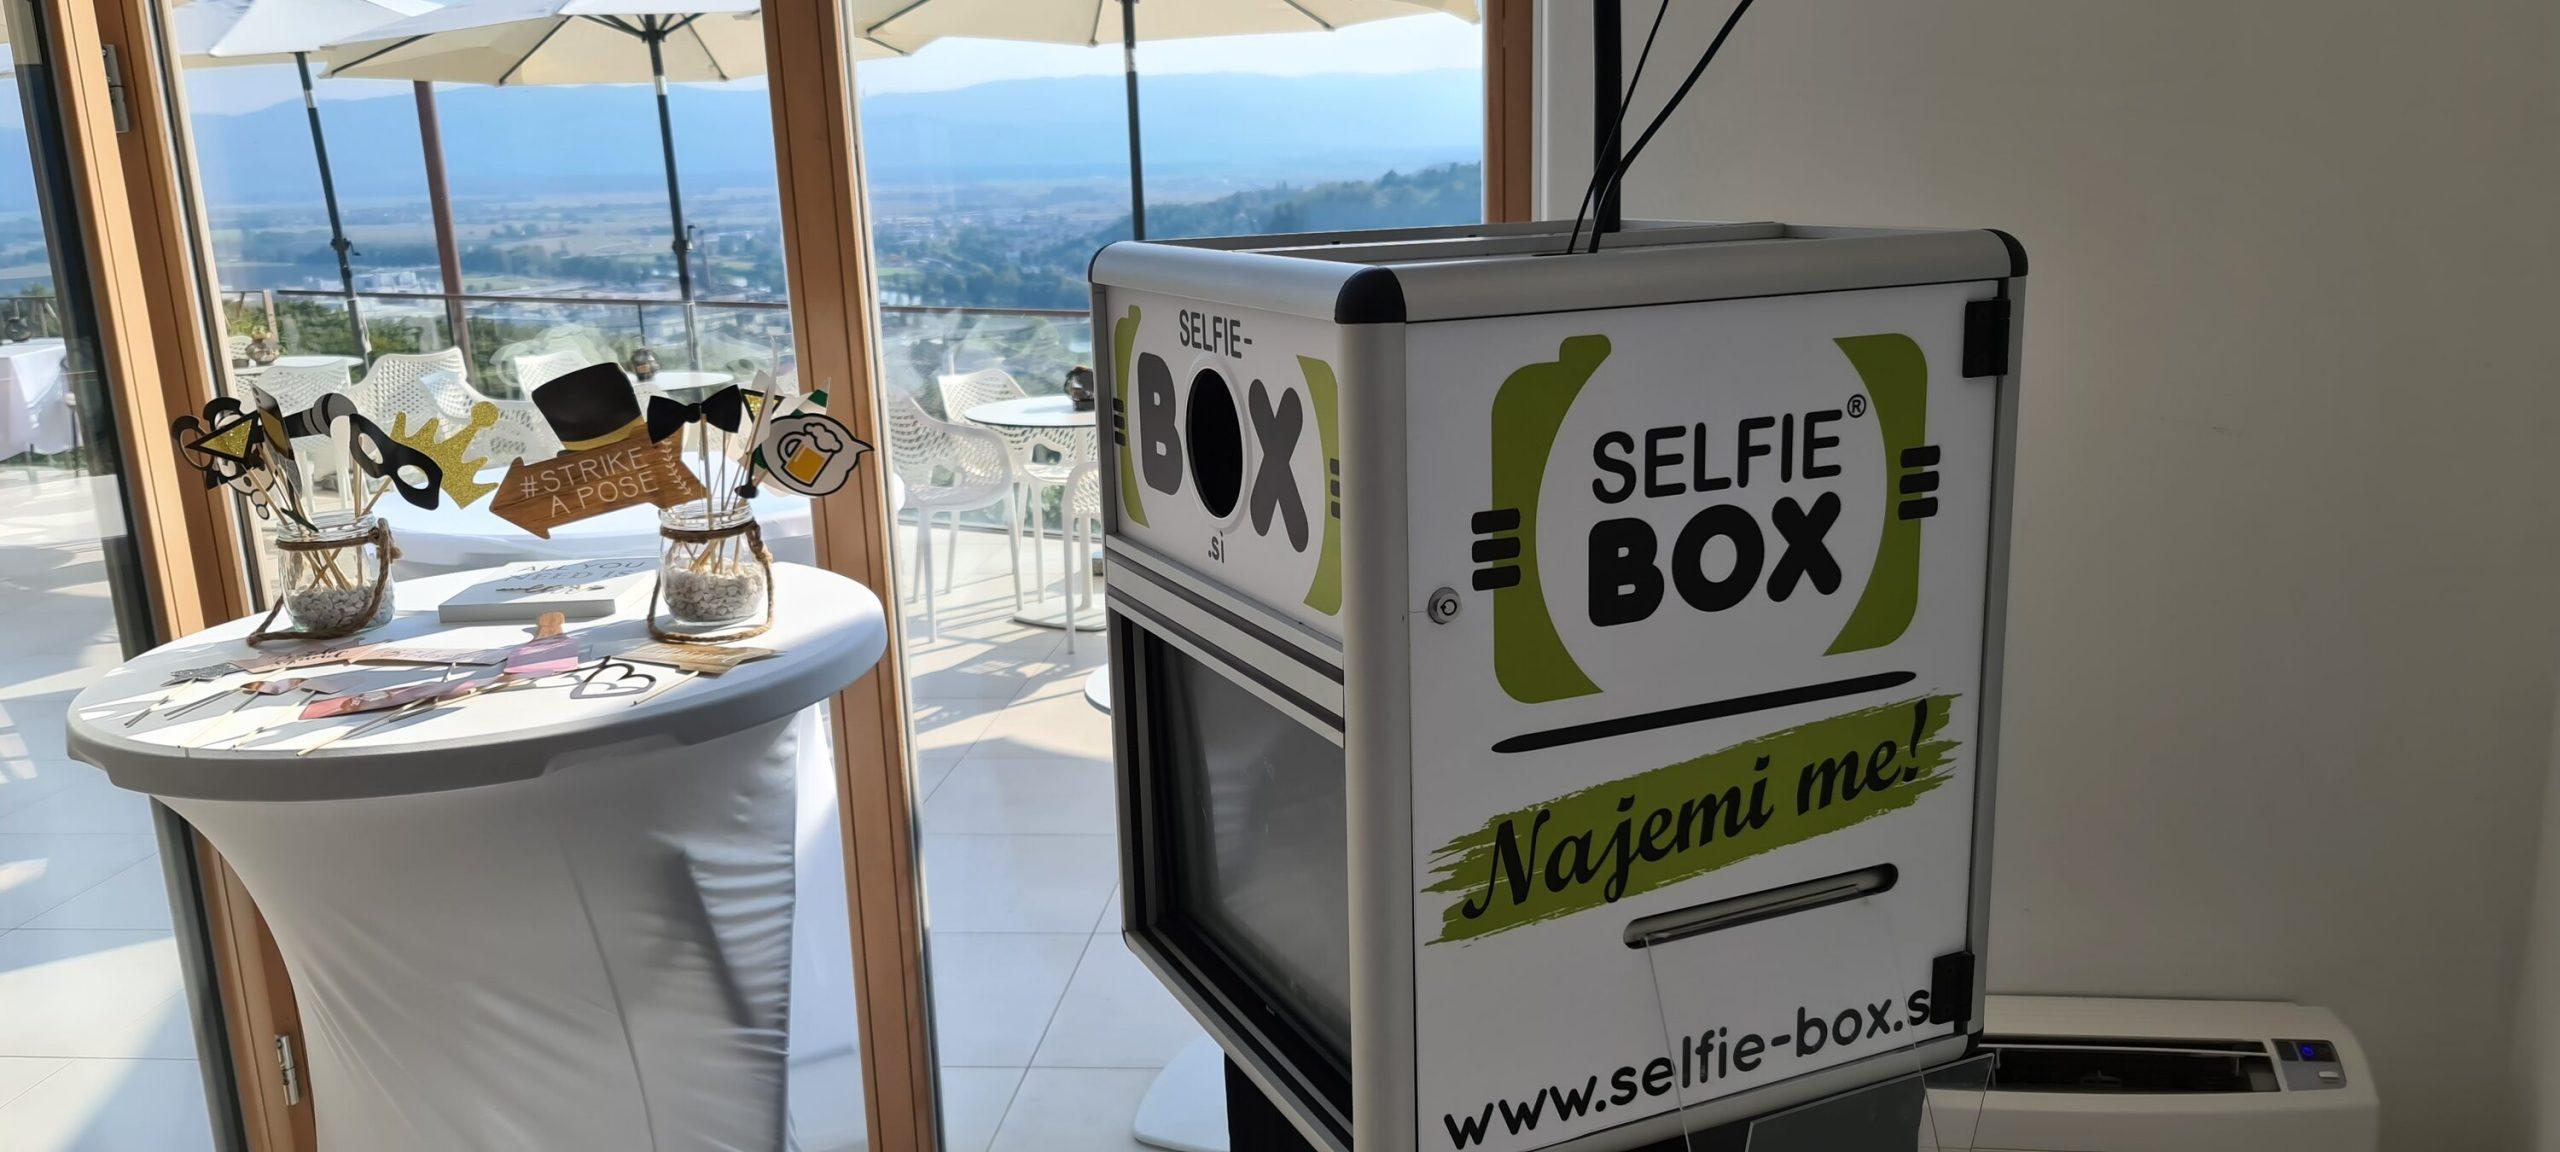 selfie-box.si